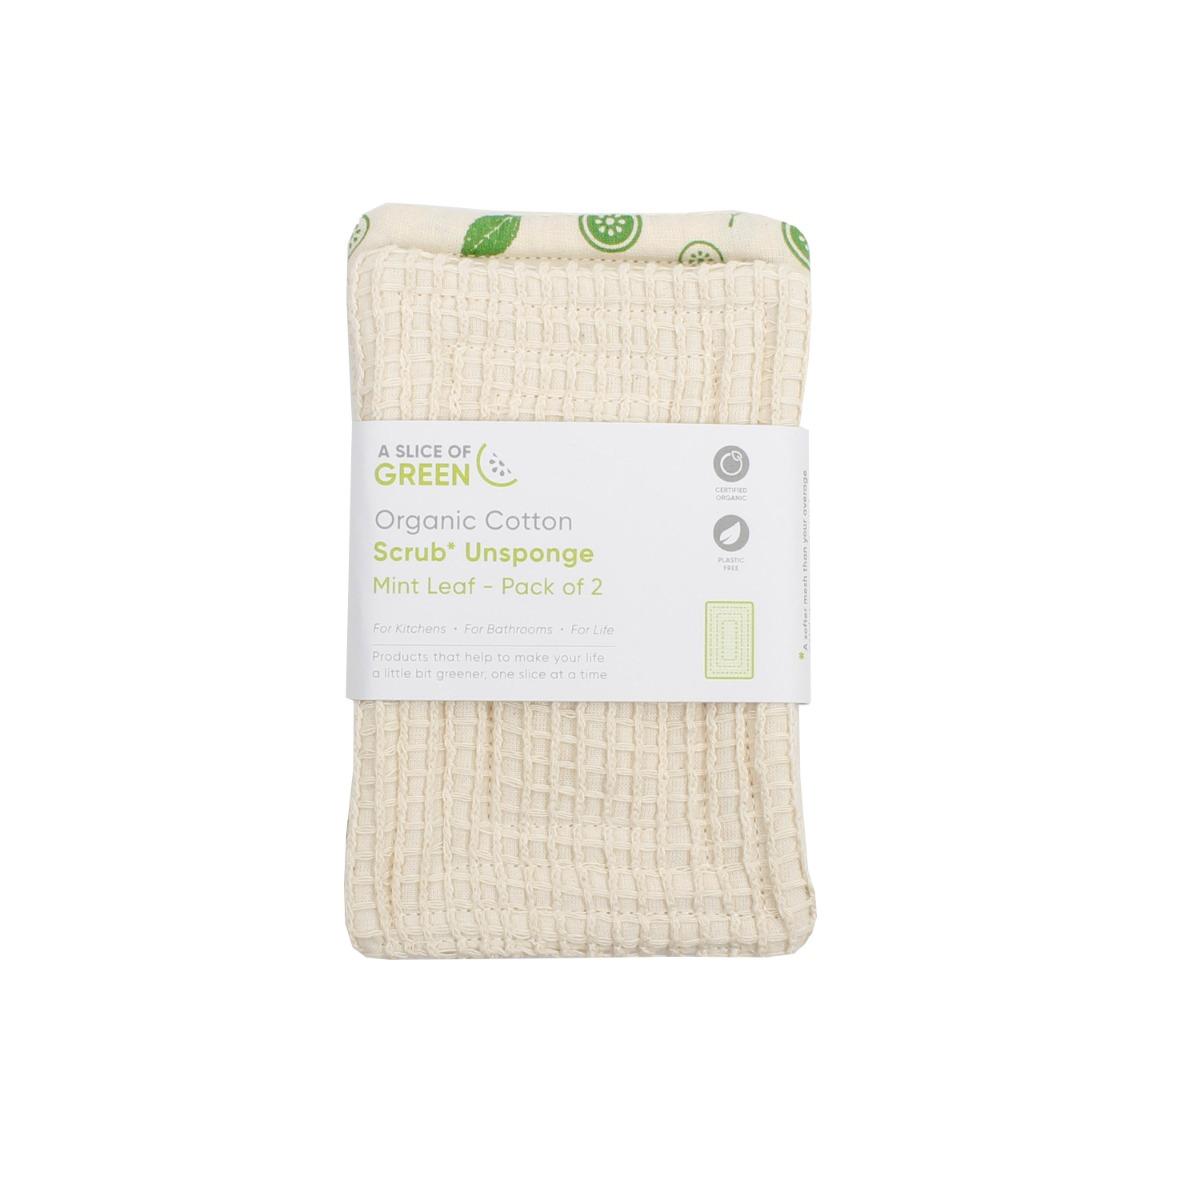 A Slice of Green - Organic Cotton Scrub 'Unsponge' - Mint Leaf 2 Pack